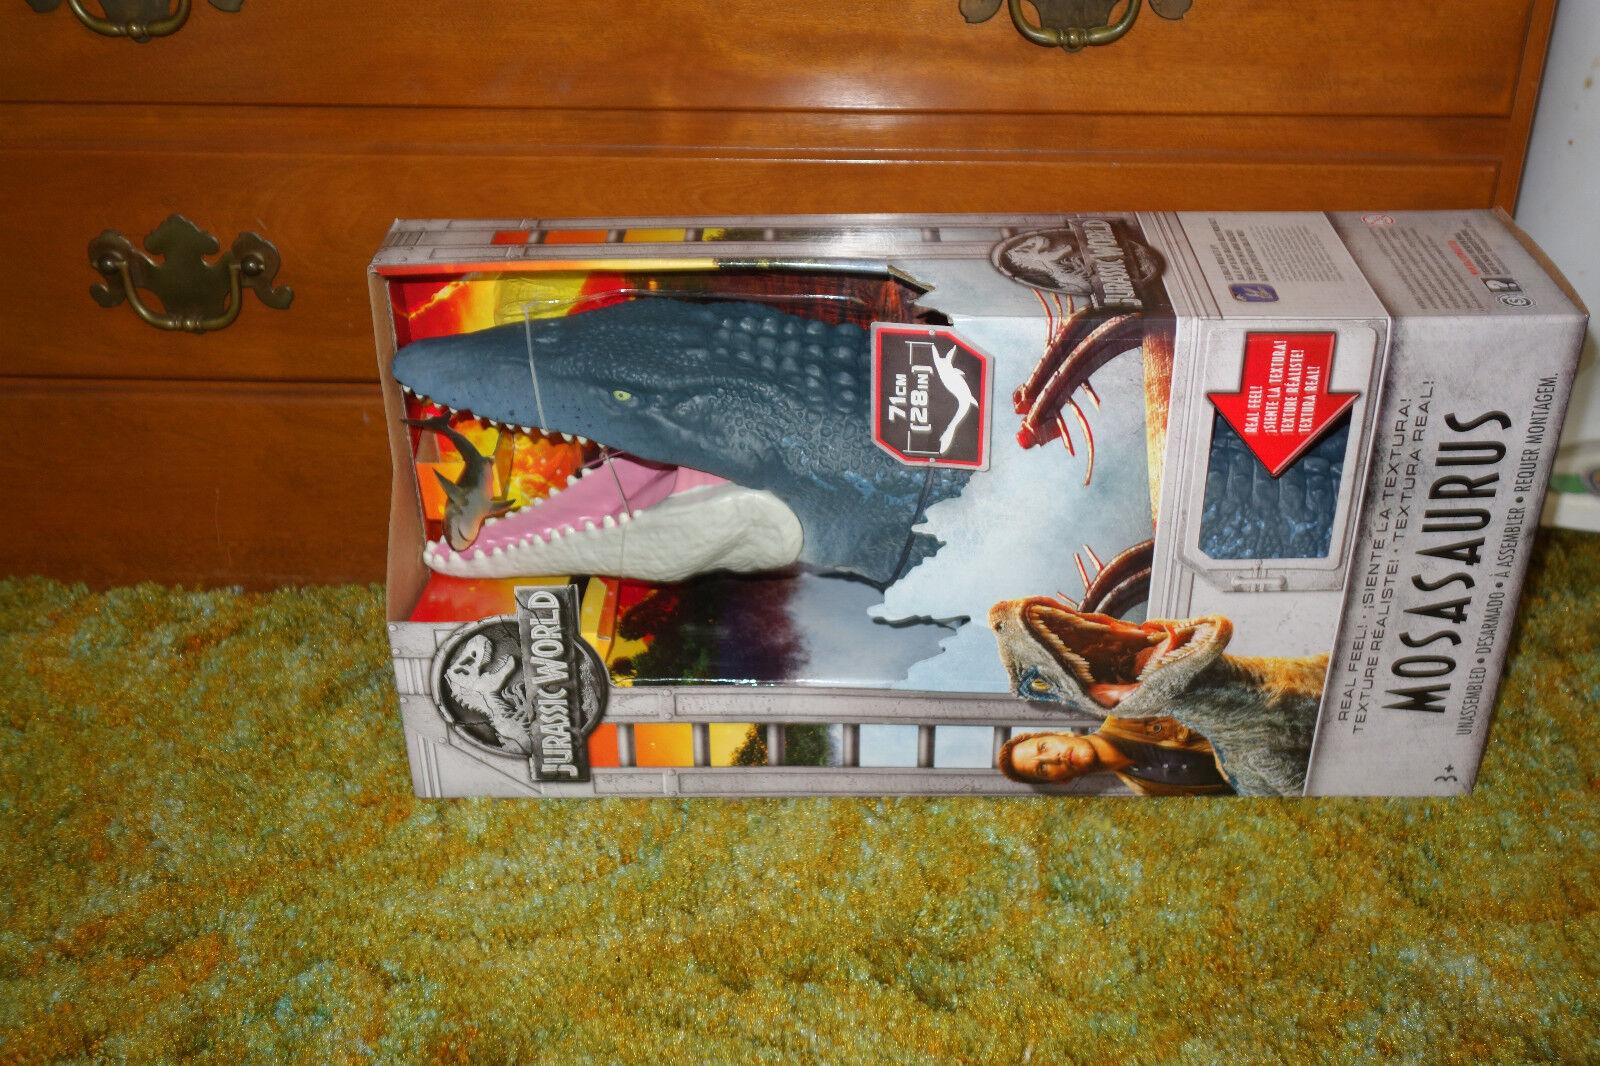 Jurassic World Mosasaurus Toy Brand New in Box Grand JW